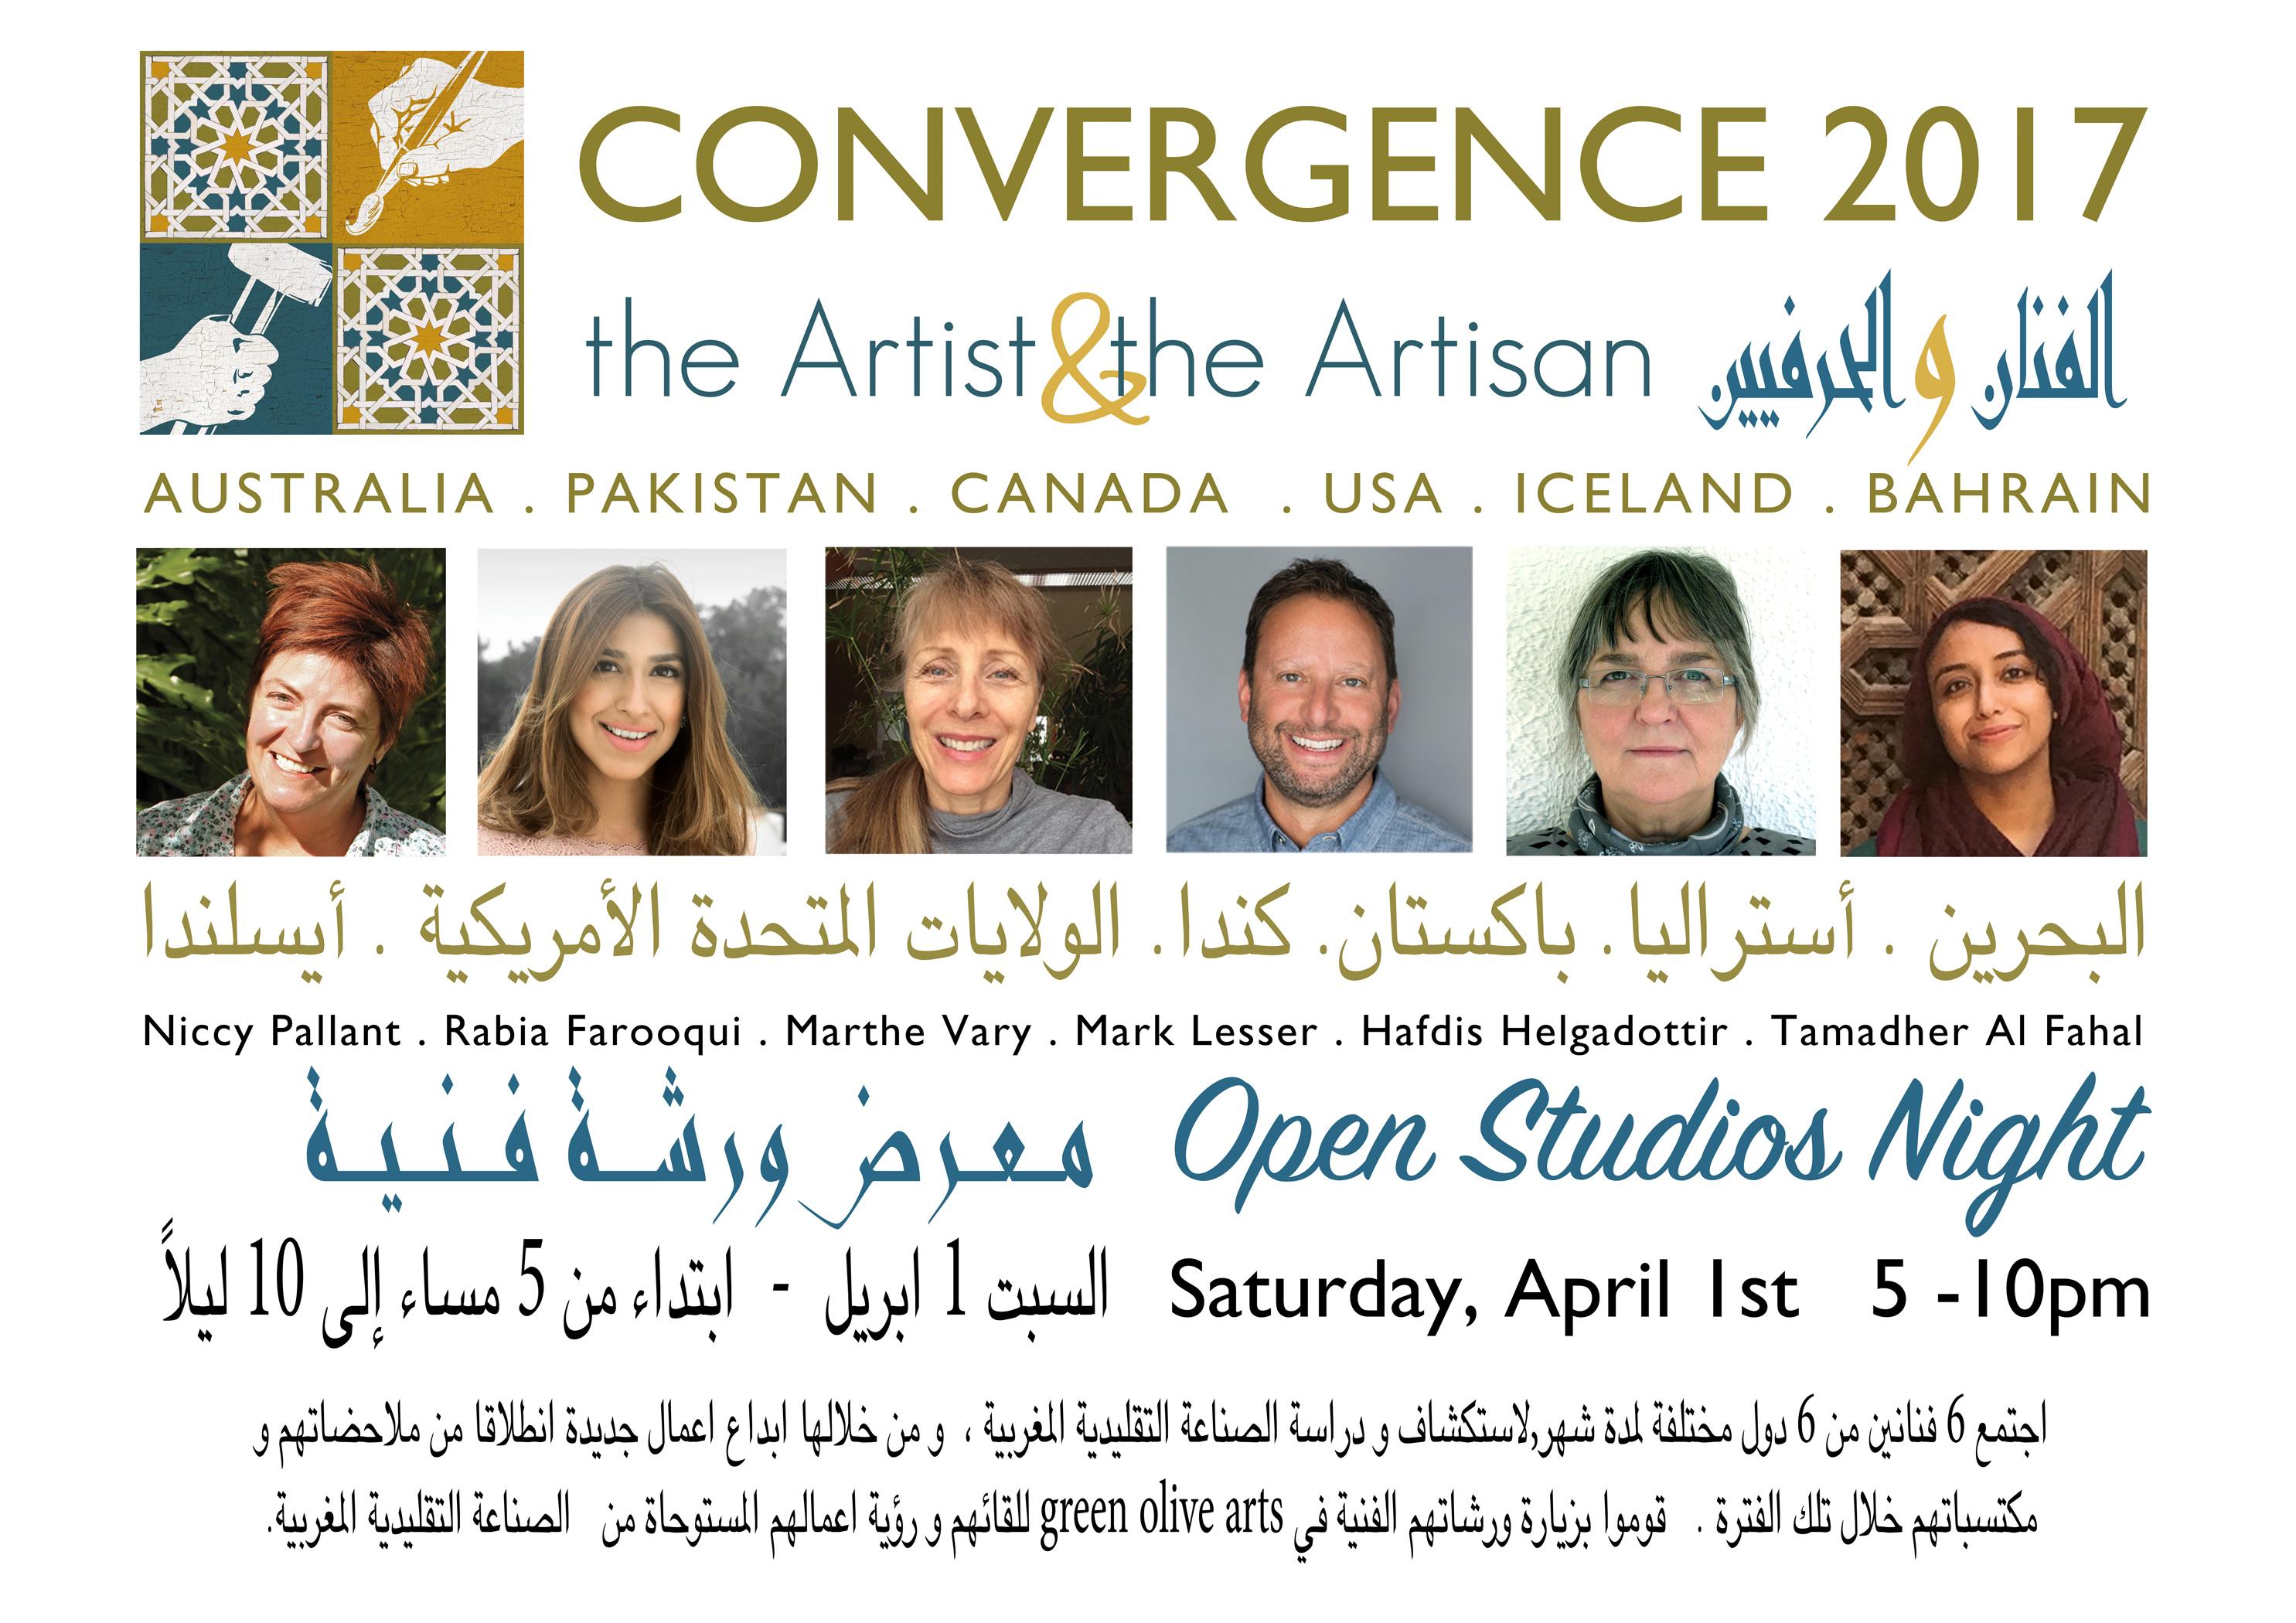 Convergence2017 Open Studios Night